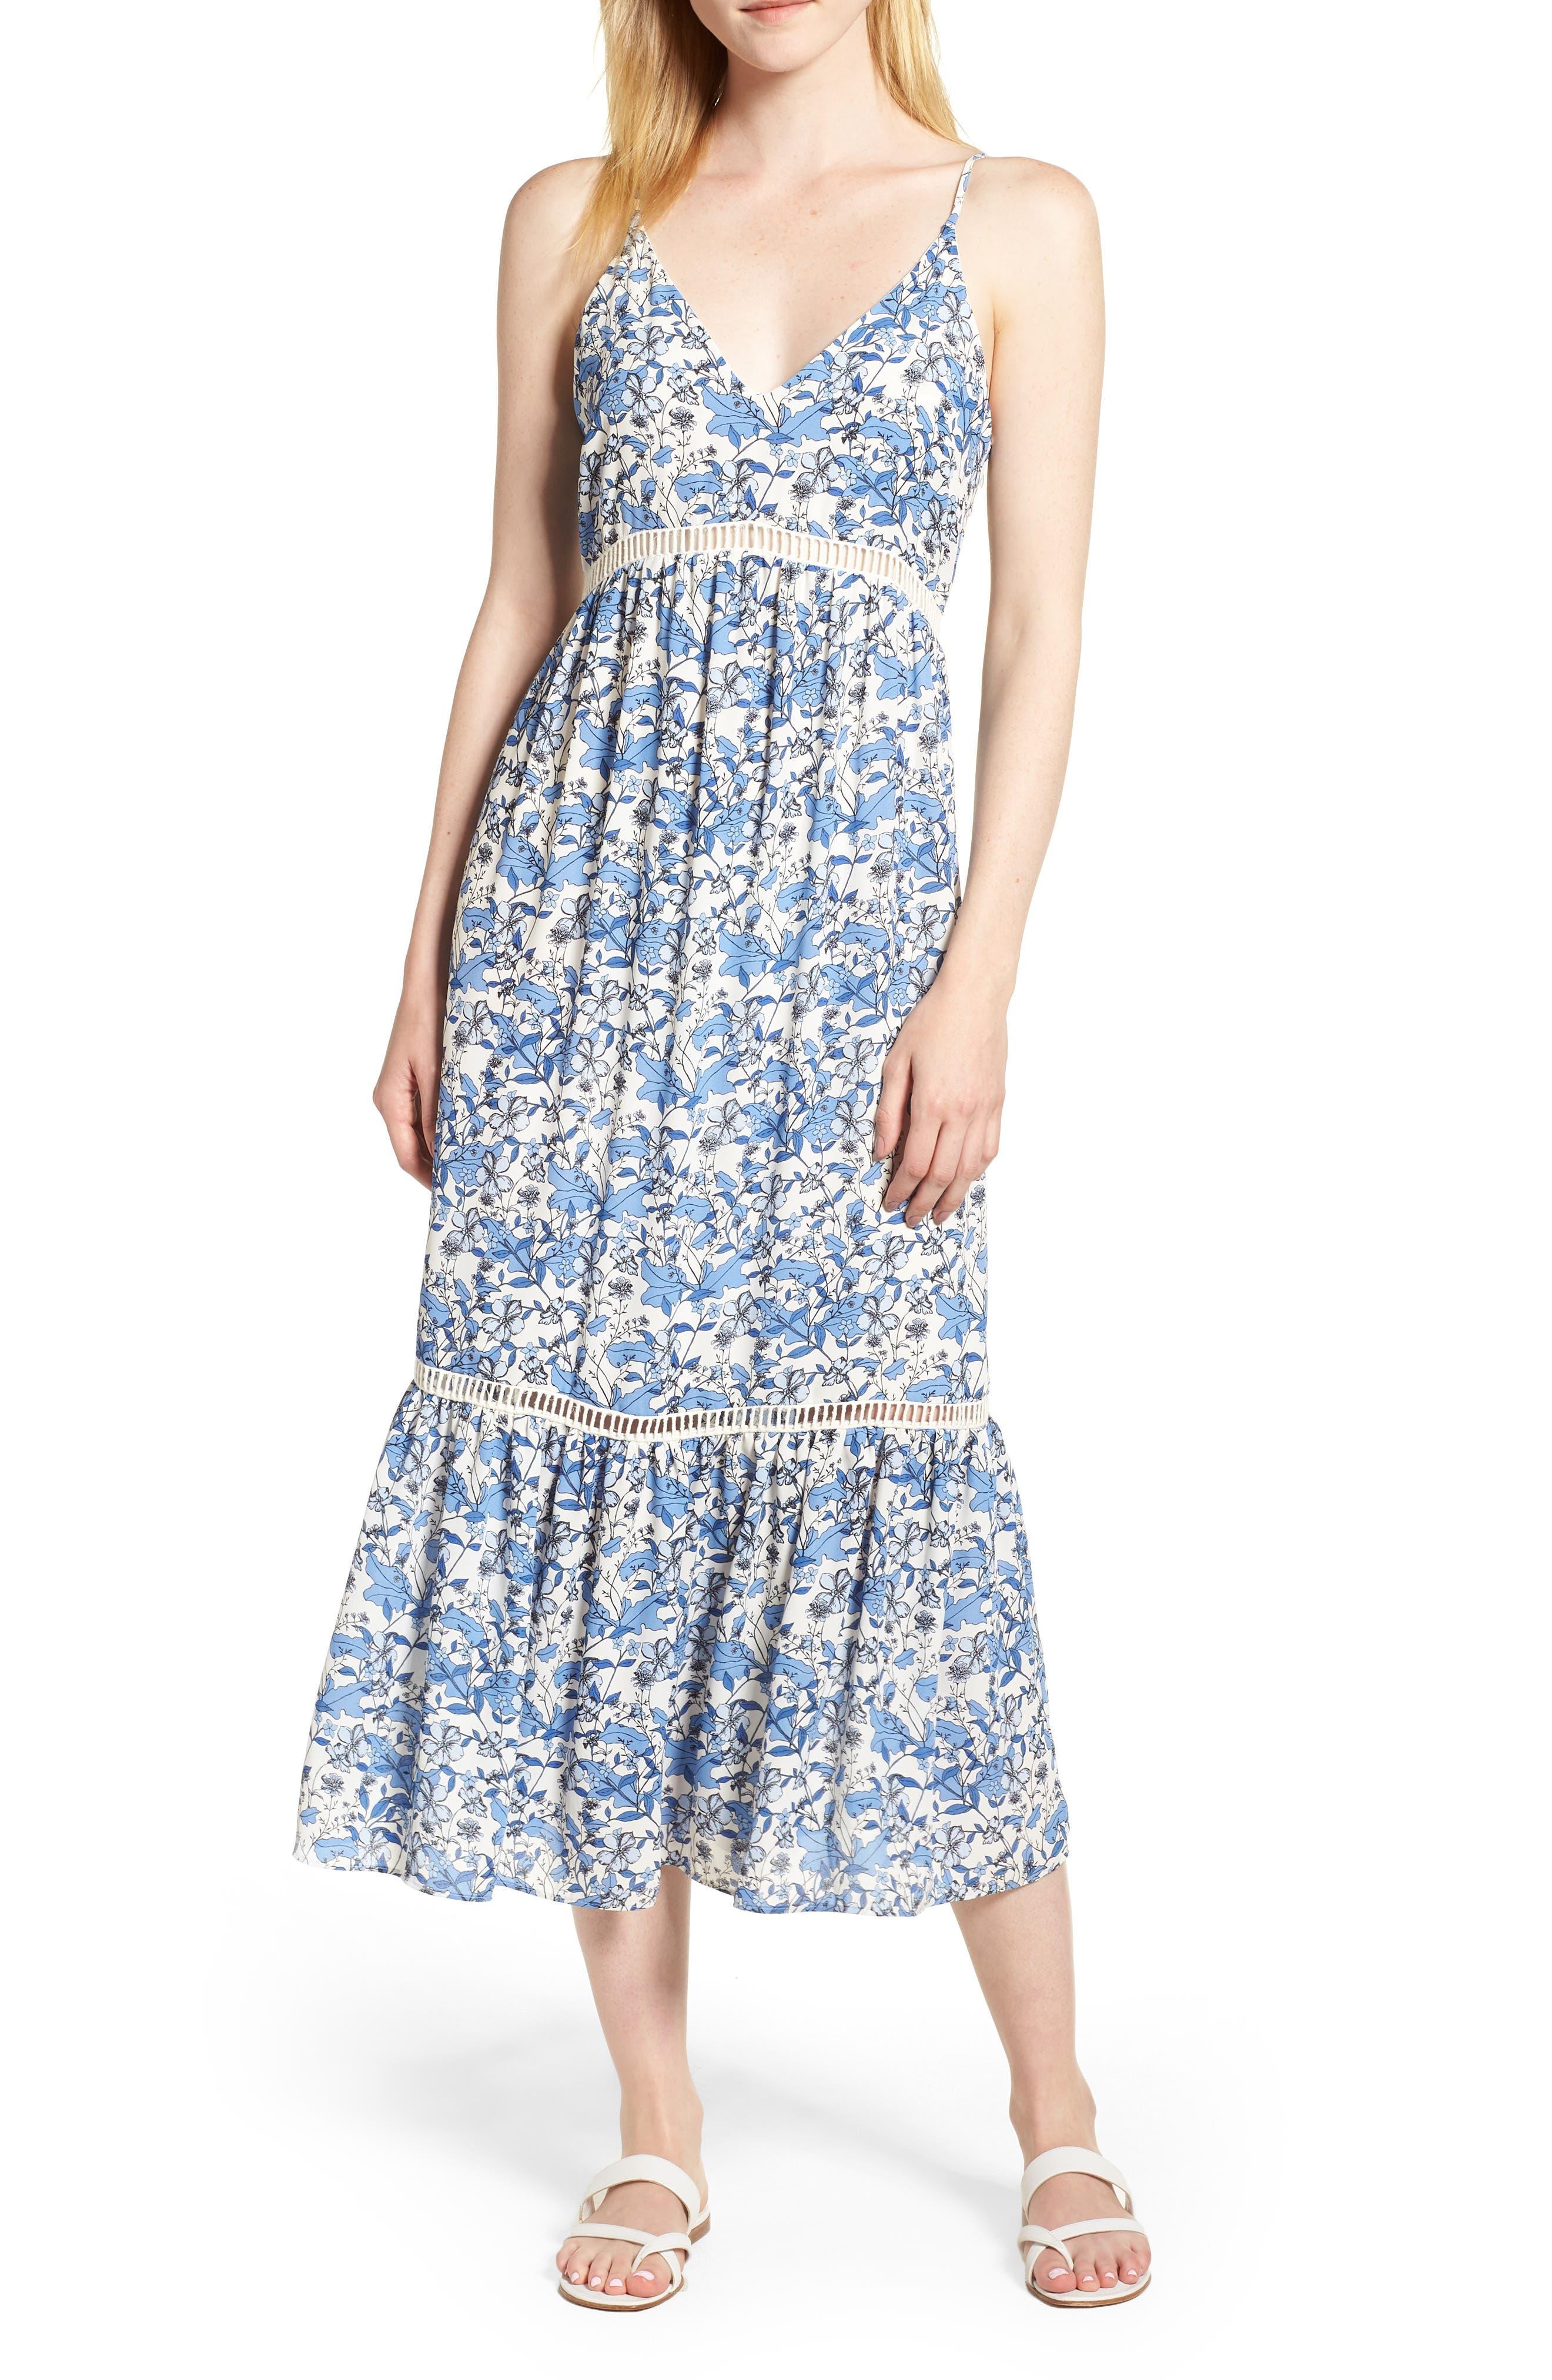 Ivy Forest Maxi Dress,                         Main,                         color, Antique White